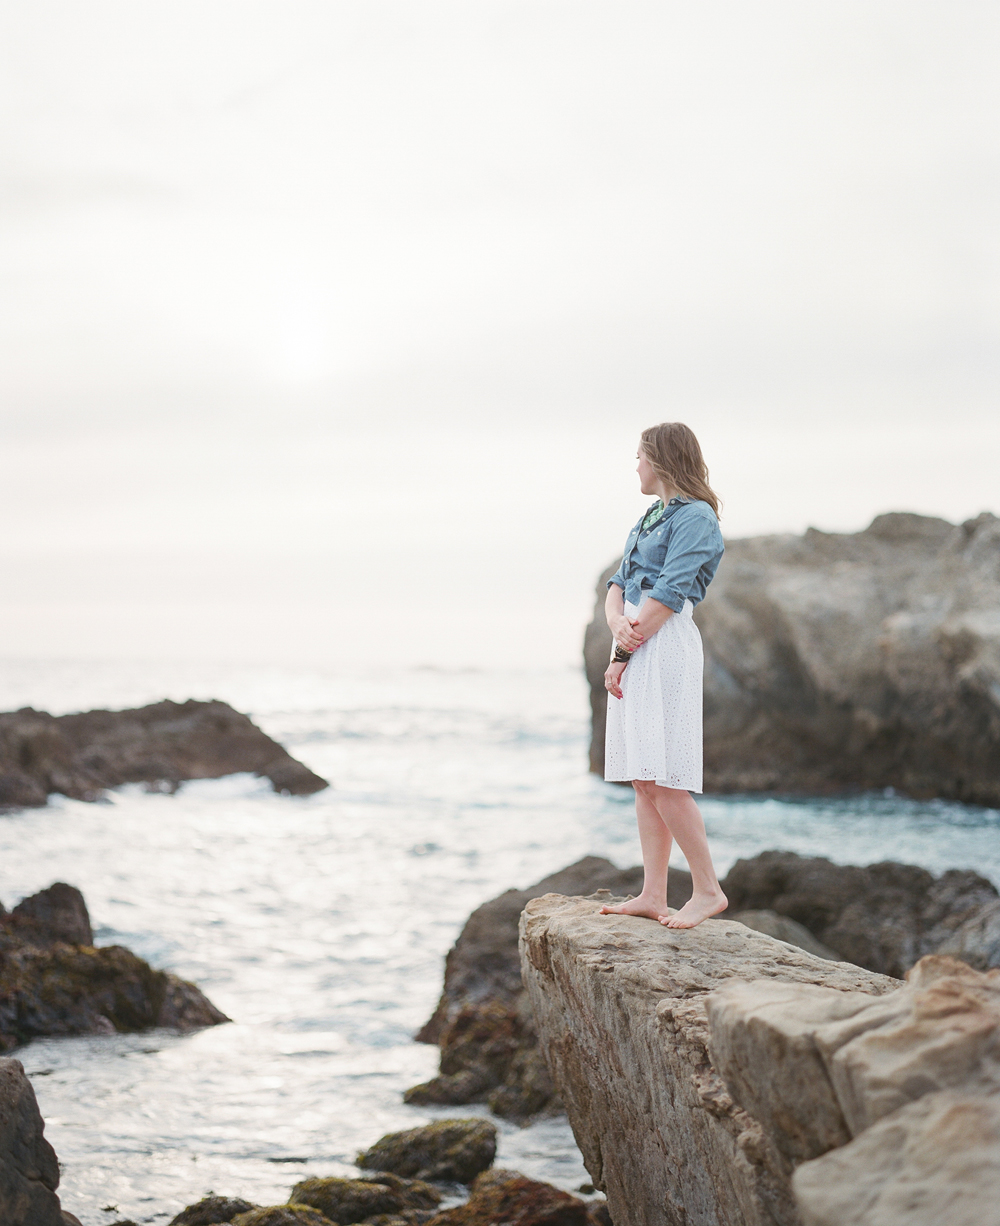 Point_Lobos_CA_Portraits_008.jpg